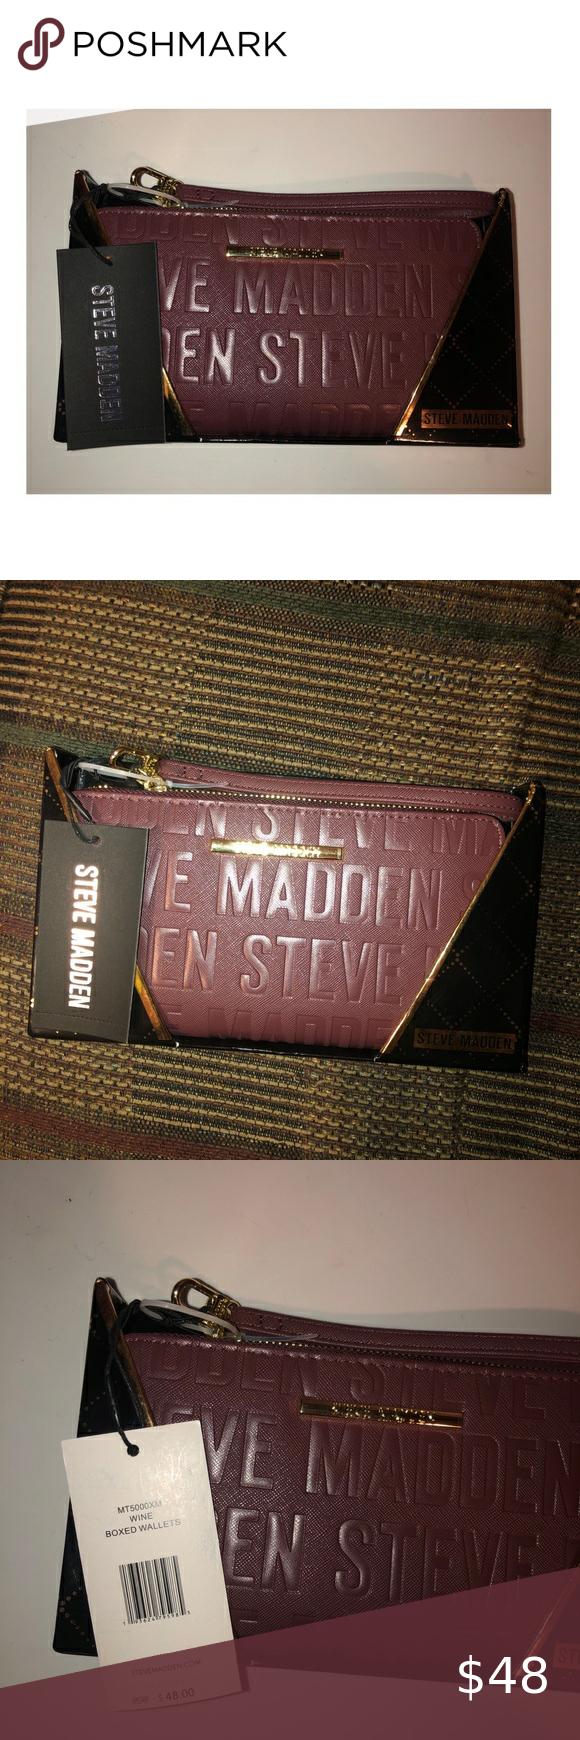 Nwt Steve Madden Wine Stamped Logo Wallet Steve Madden Wallet Steve Madden Bags Striped Wallet